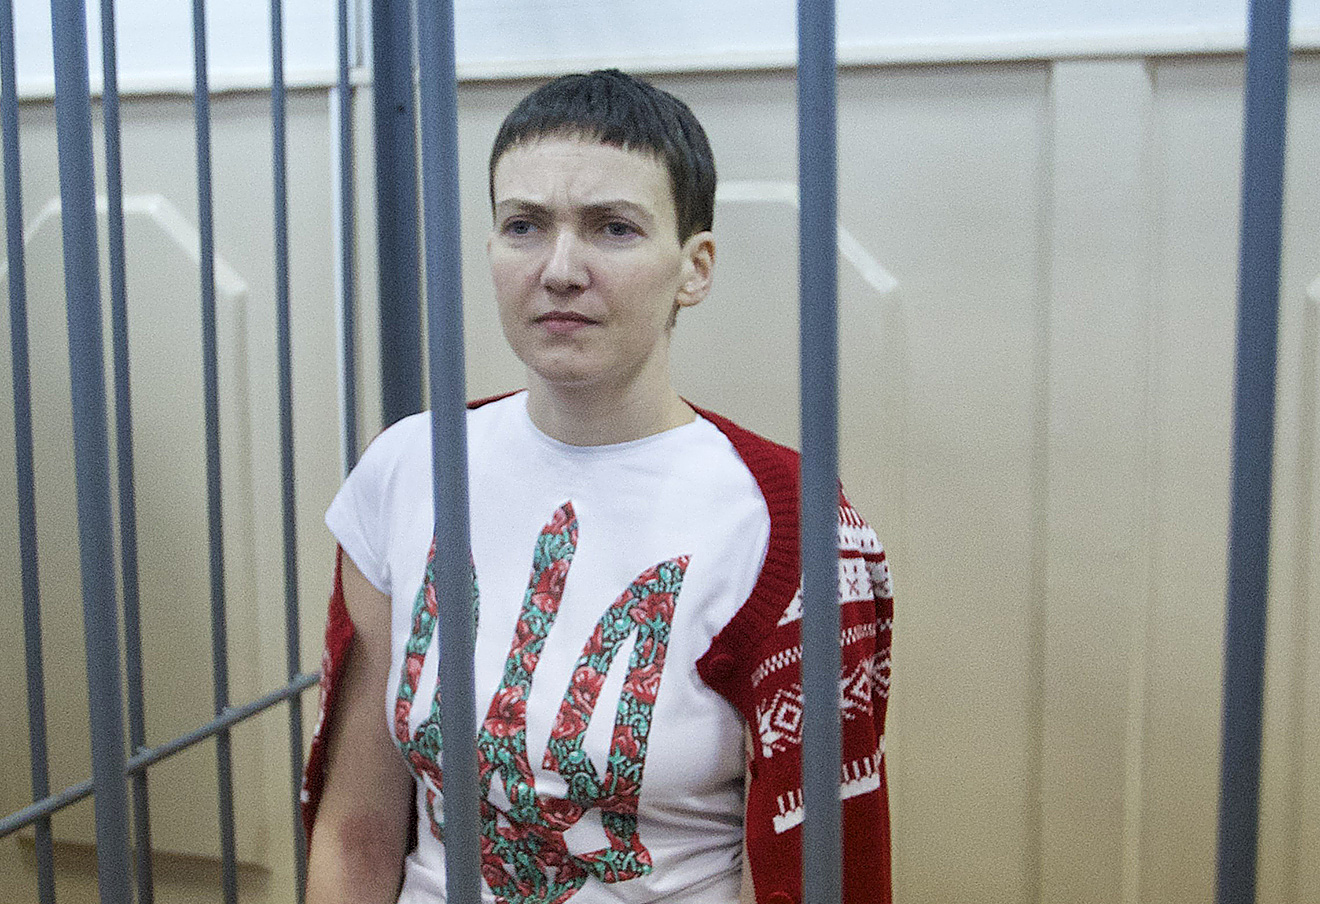 Госдеп США: приговор Савченко - это пренебрежение правосудием